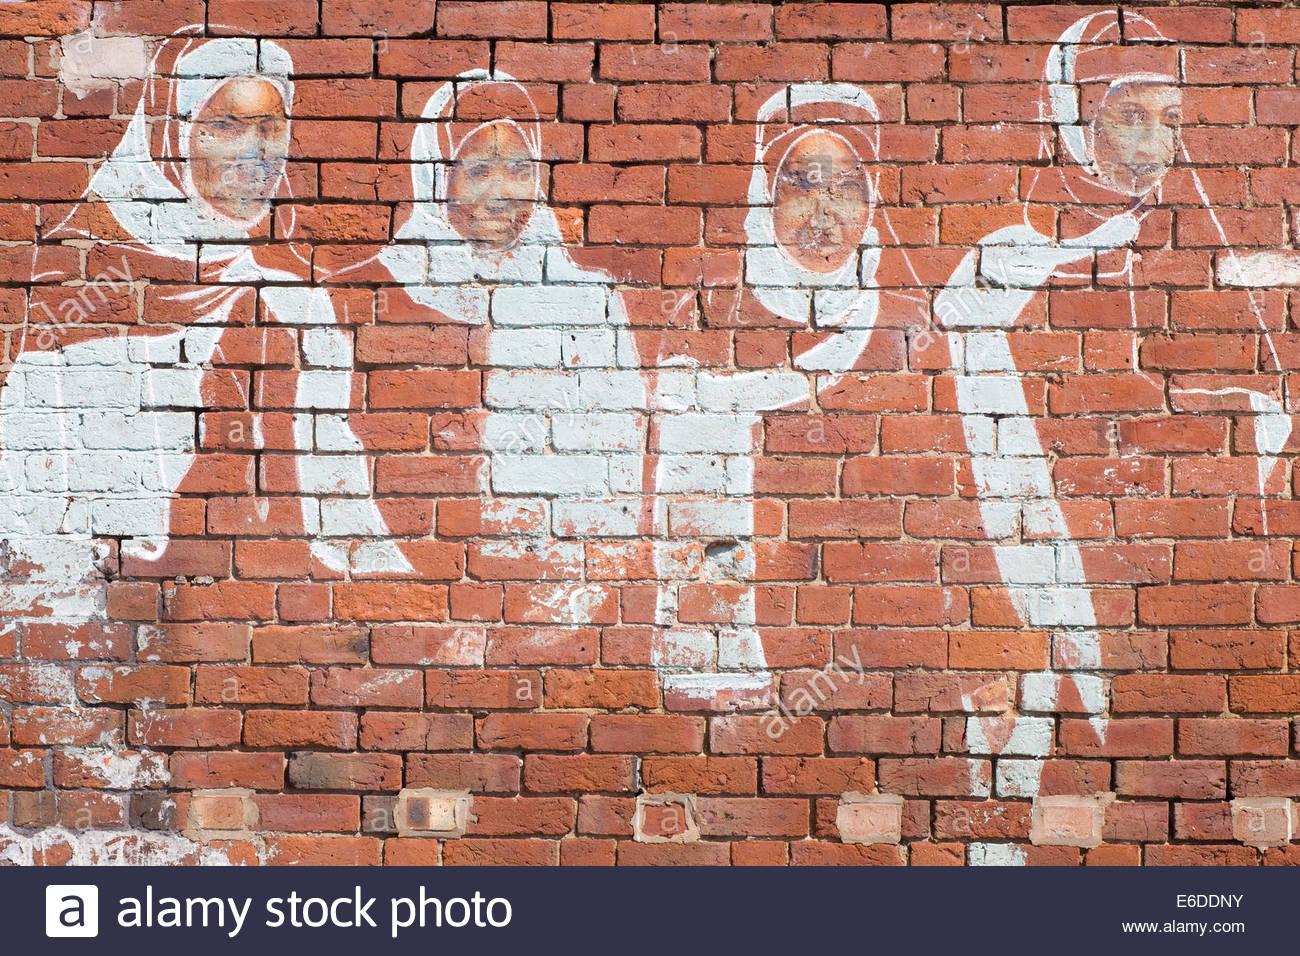 Street Art Graffiti of Muslim Women wearing hijabs Traditional Clothing - Stock Image